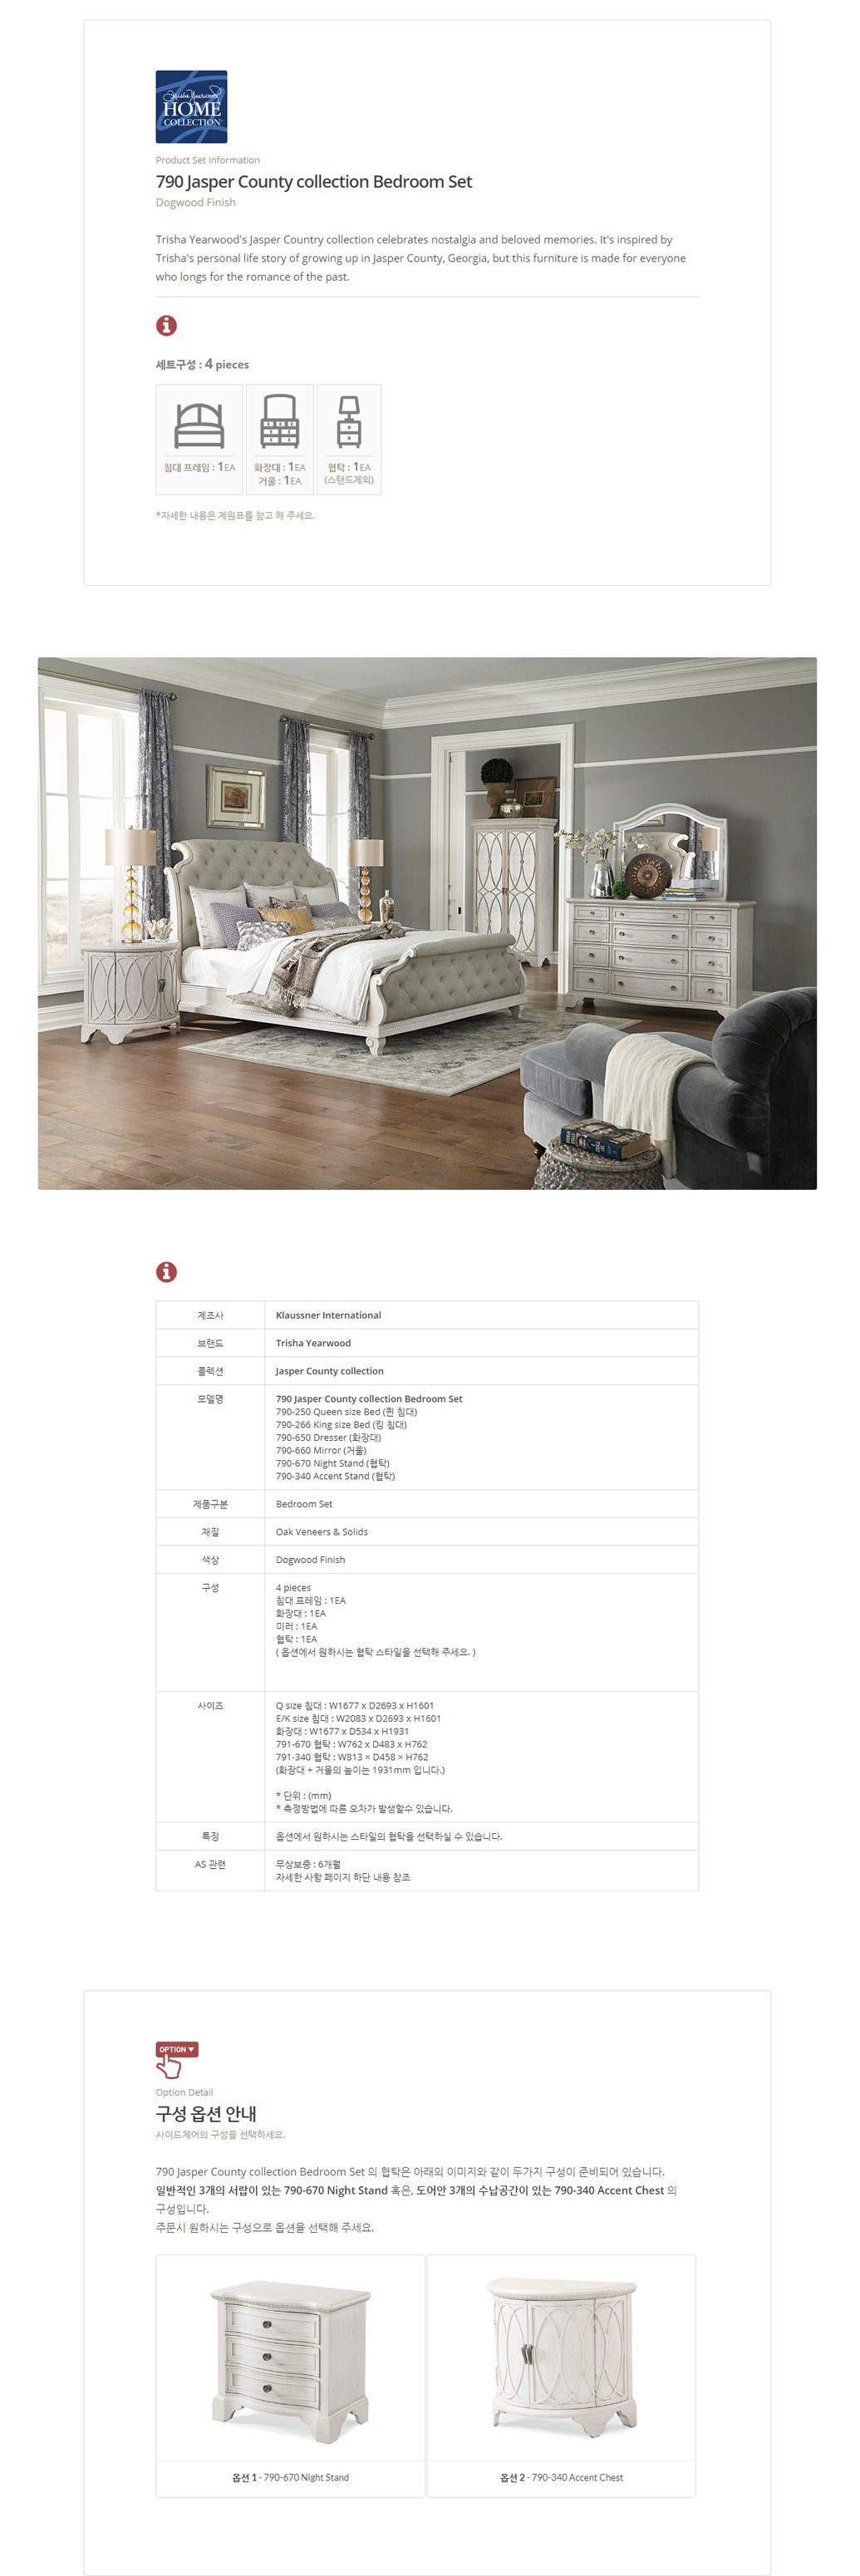 790_Jasper_County_Bedroom_Set_01.jpg